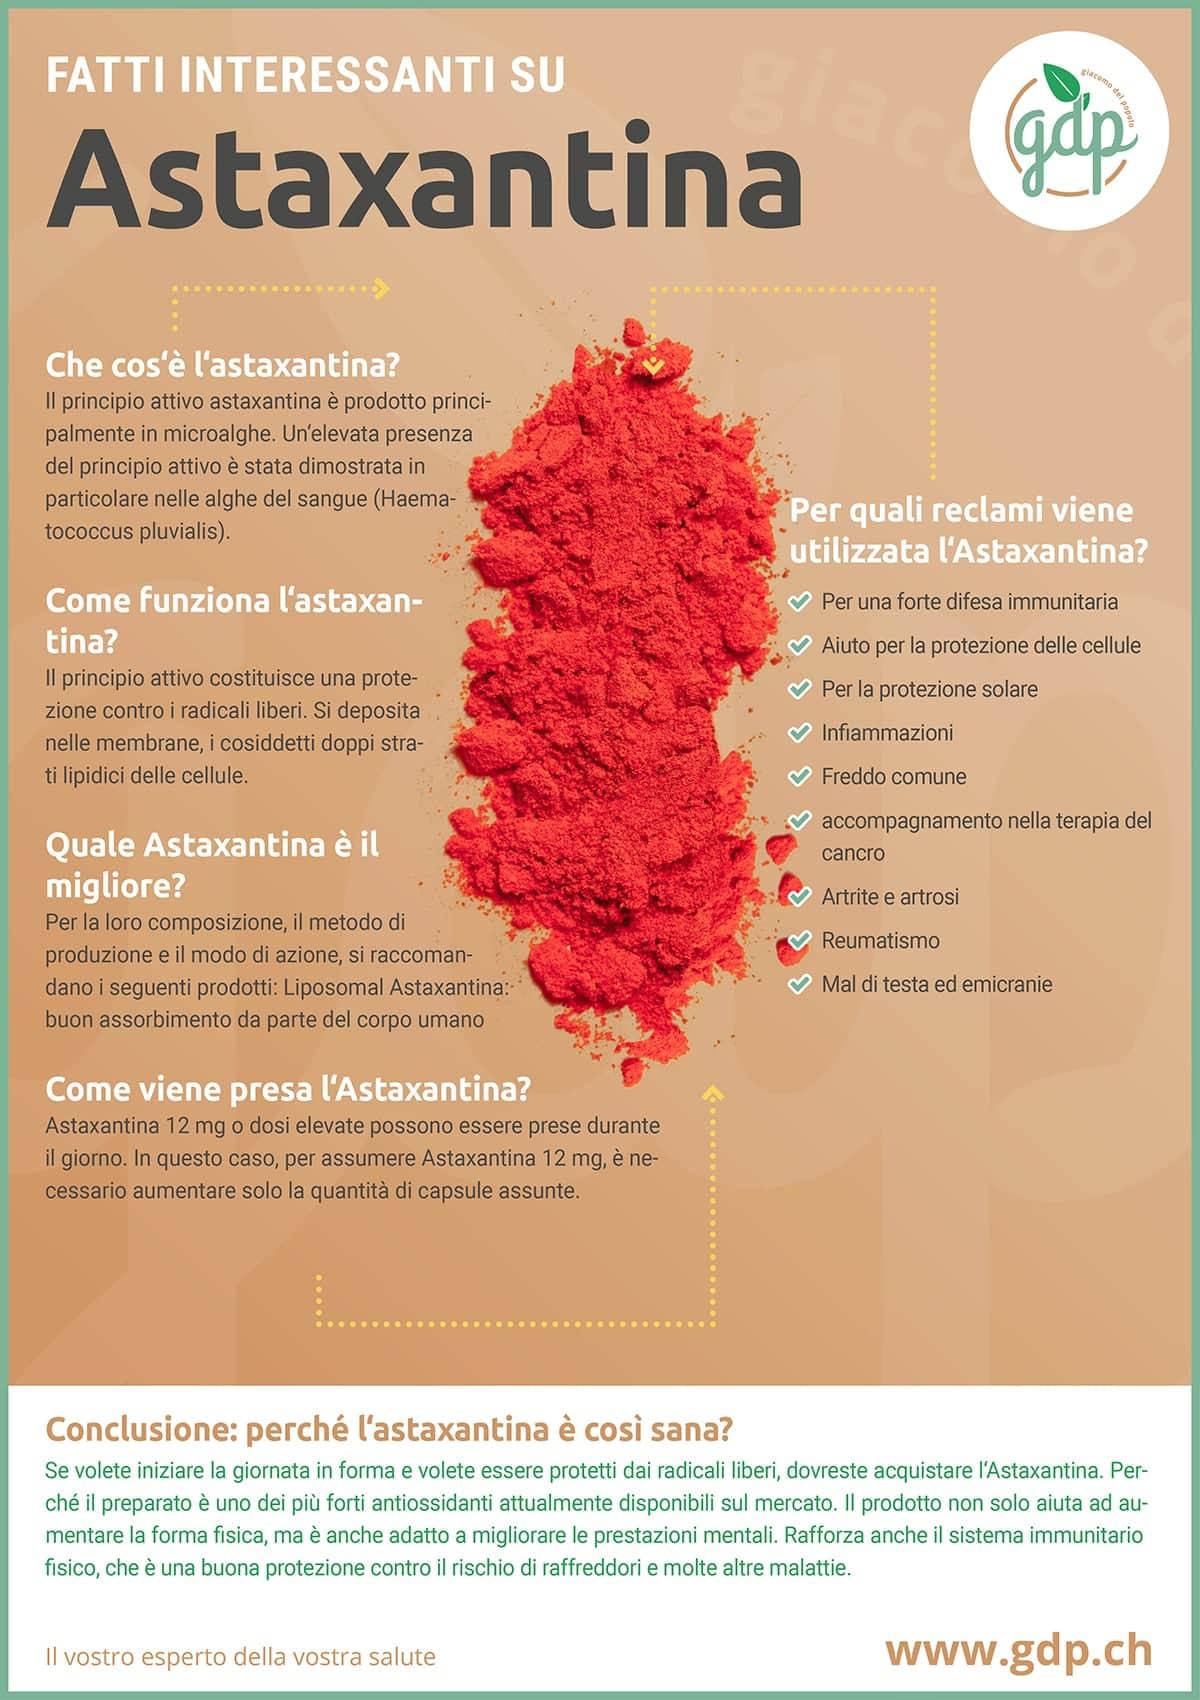 gdp infografica Astaxantina